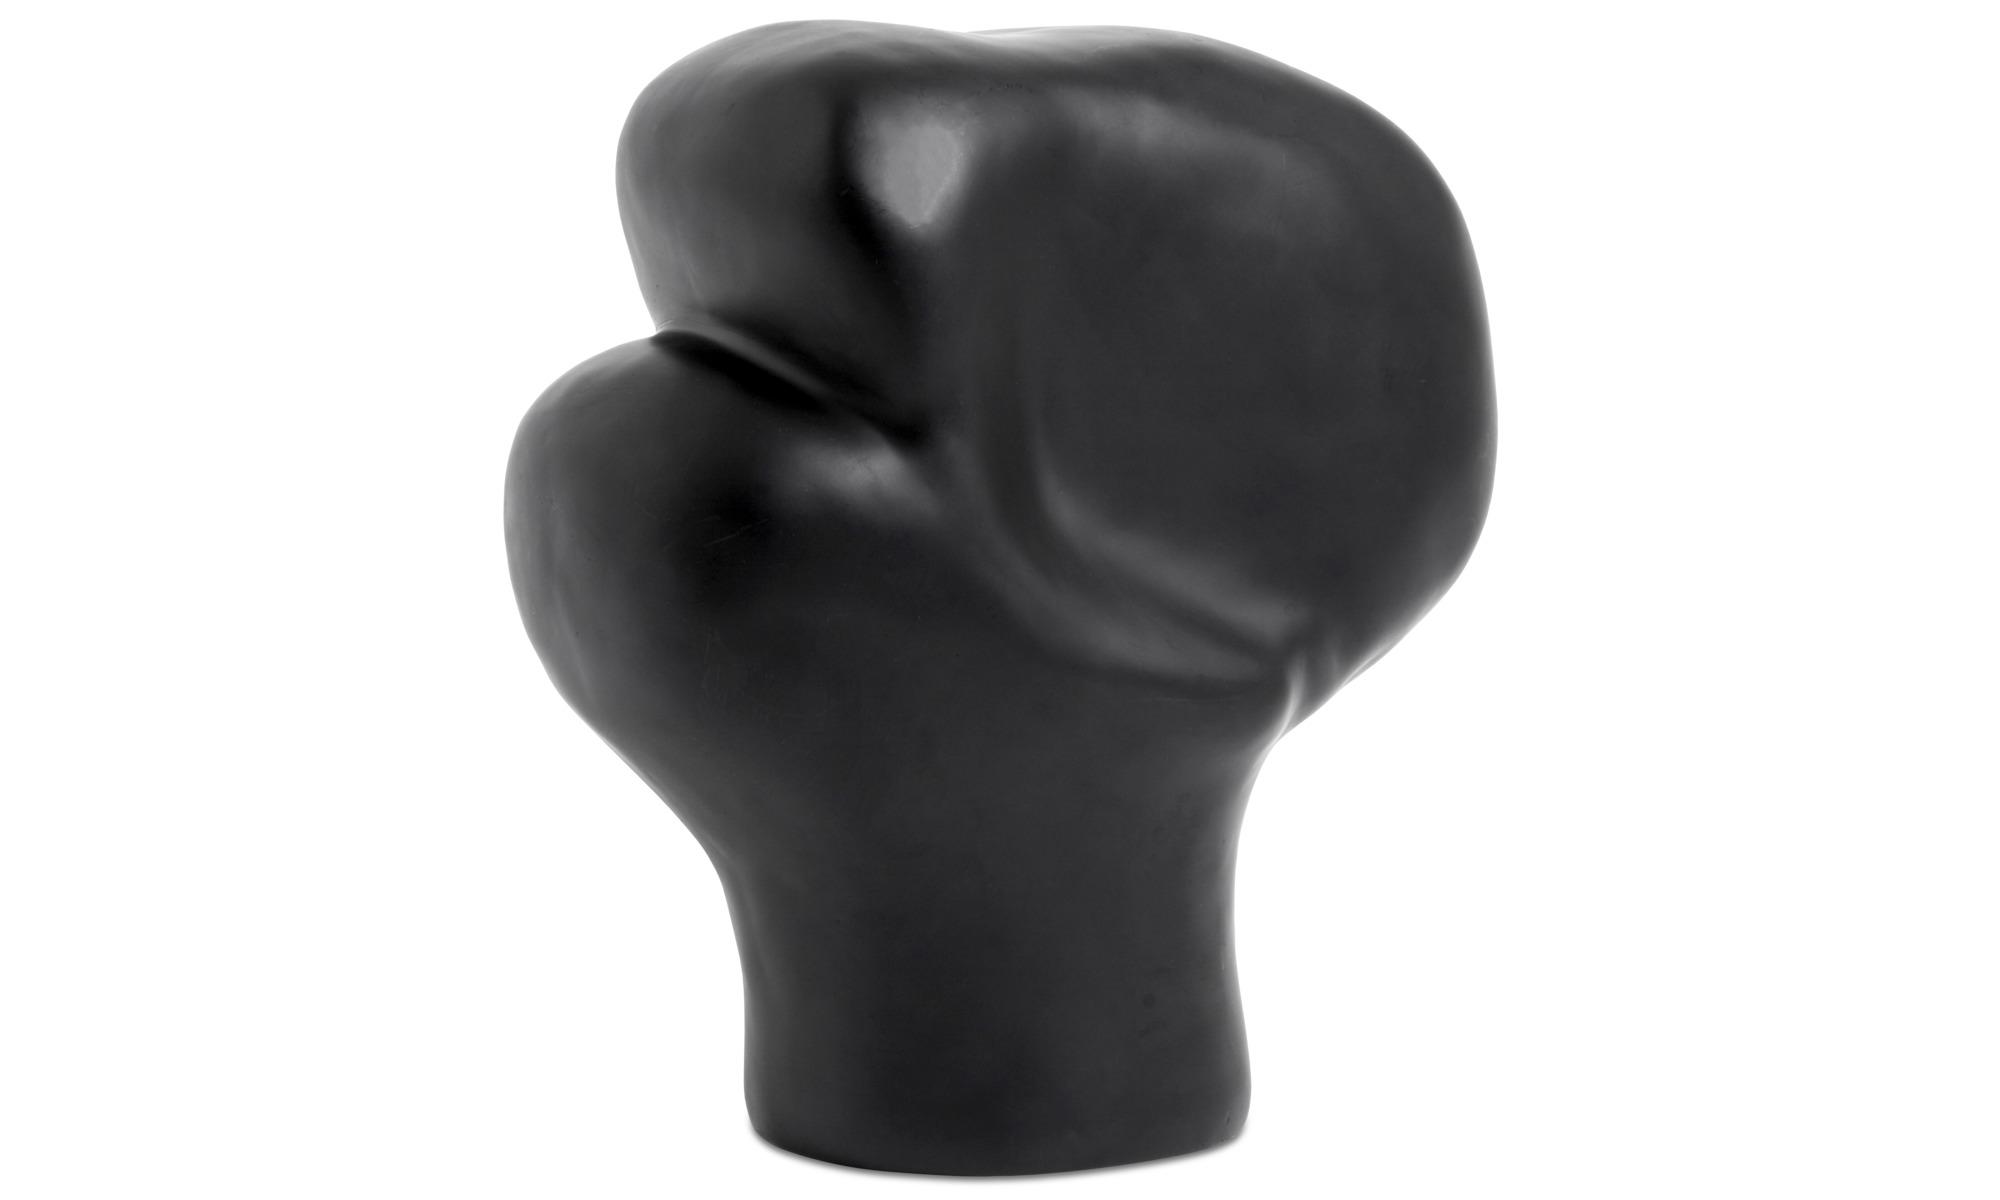 Dekoracja - Rzeźba Unreal - Czarny - Plastik